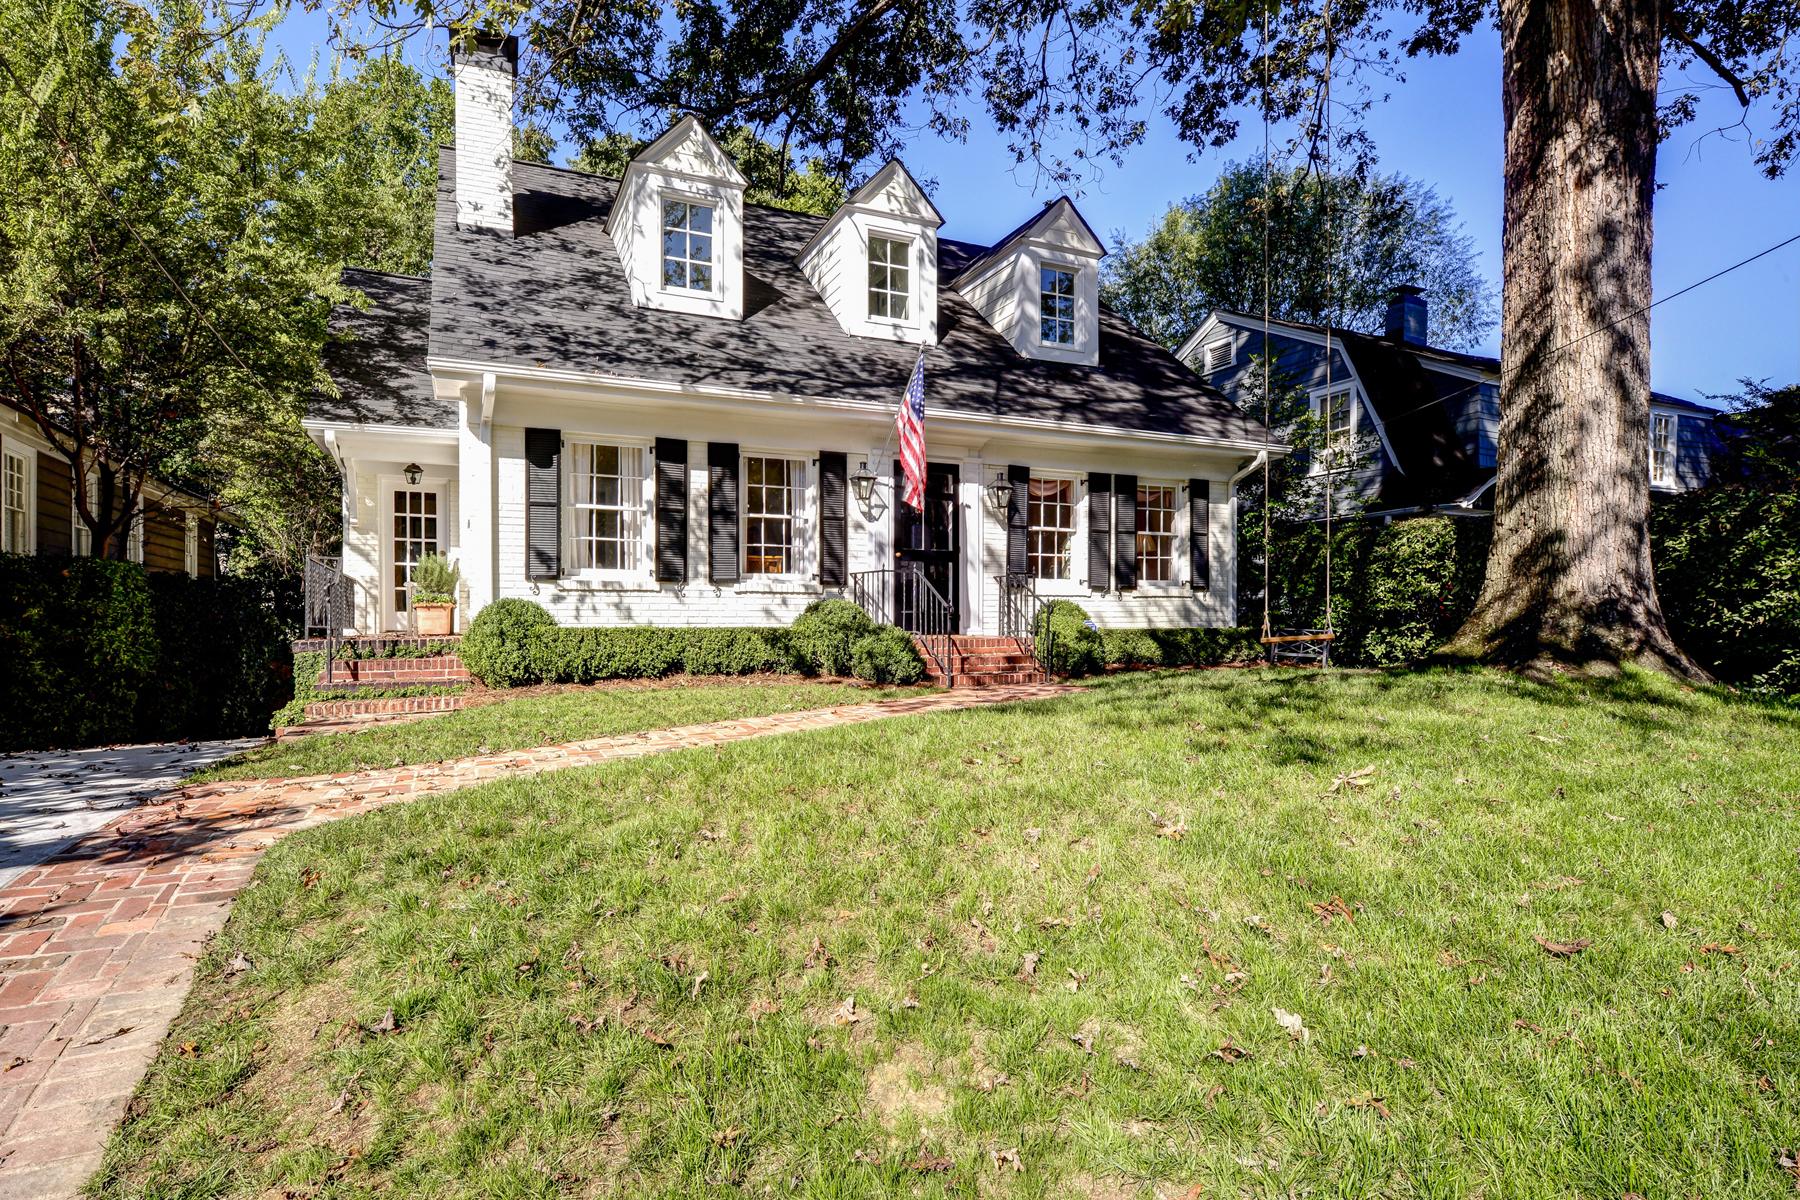 Single Family Home for Sale at Designer Dream Buckhead Home 70 Highland Drive Peachtree Park, Atlanta, Georgia 30305 United States